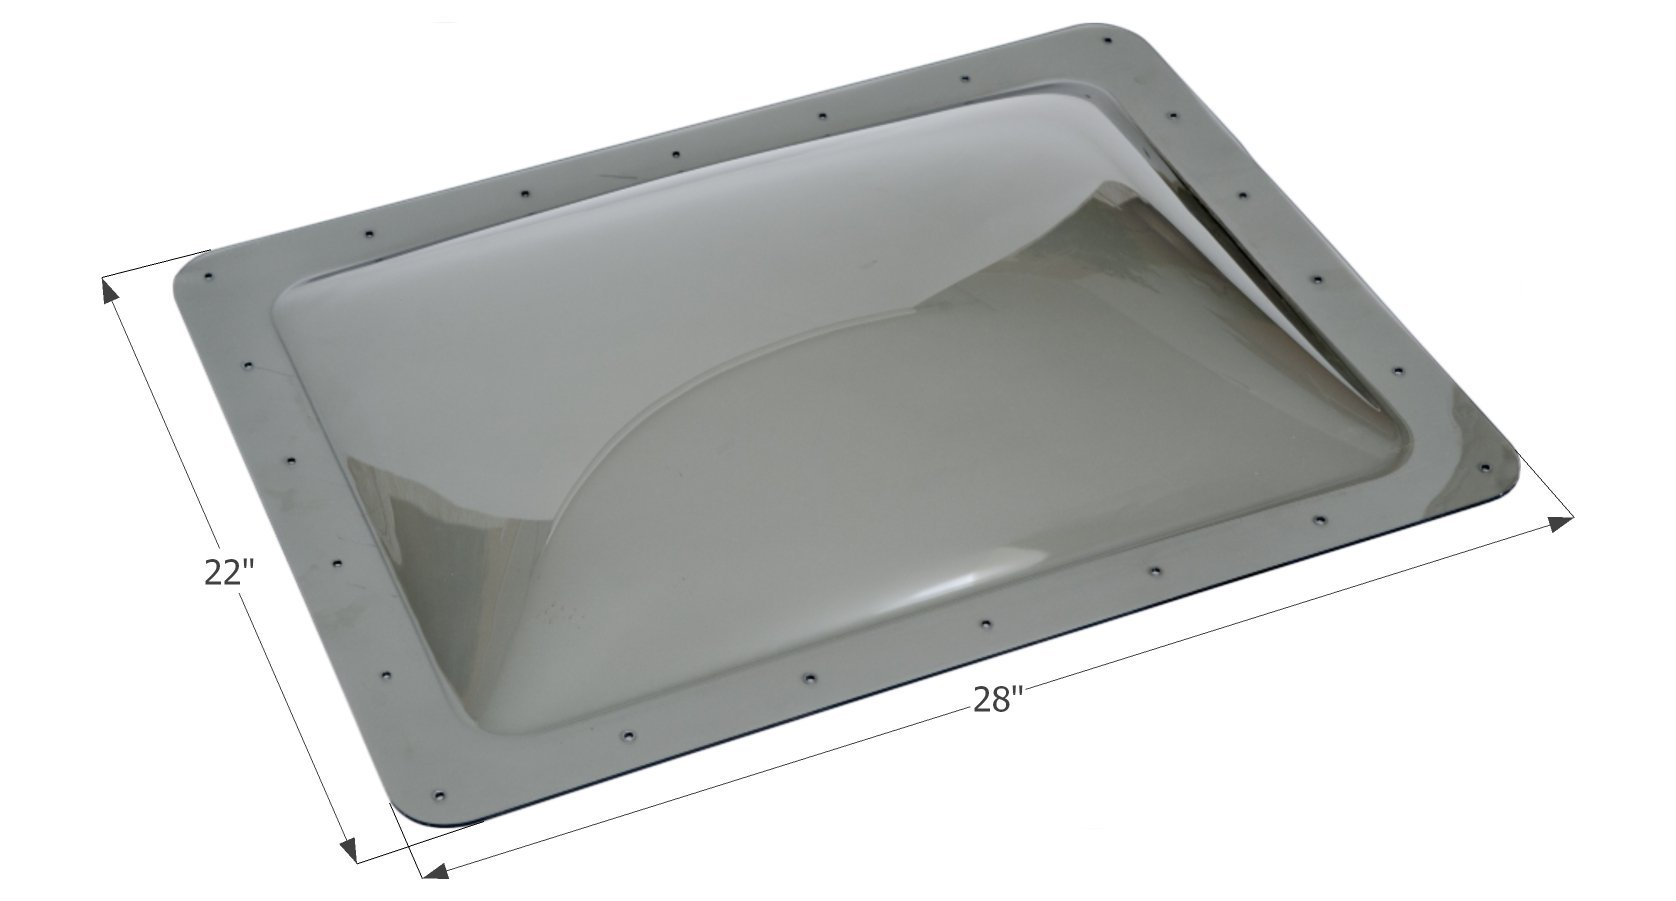 ICON 12119 RV Skylight